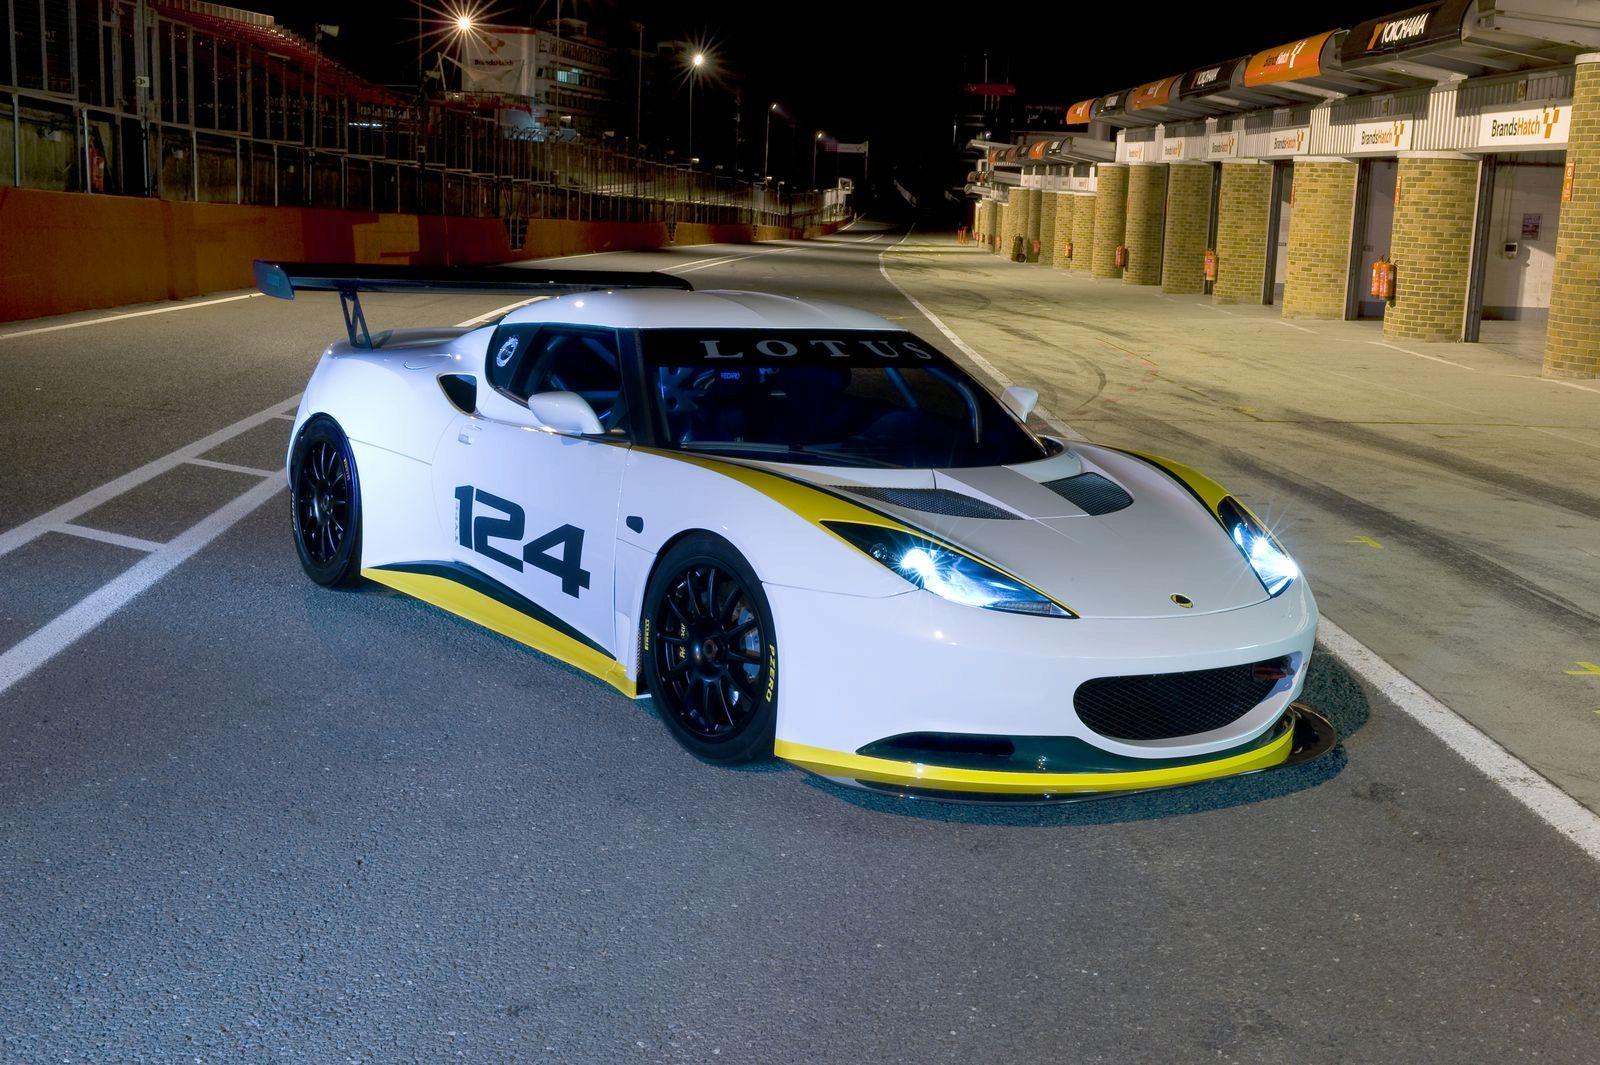 Race Car: 2010 Lotus Evora GT4